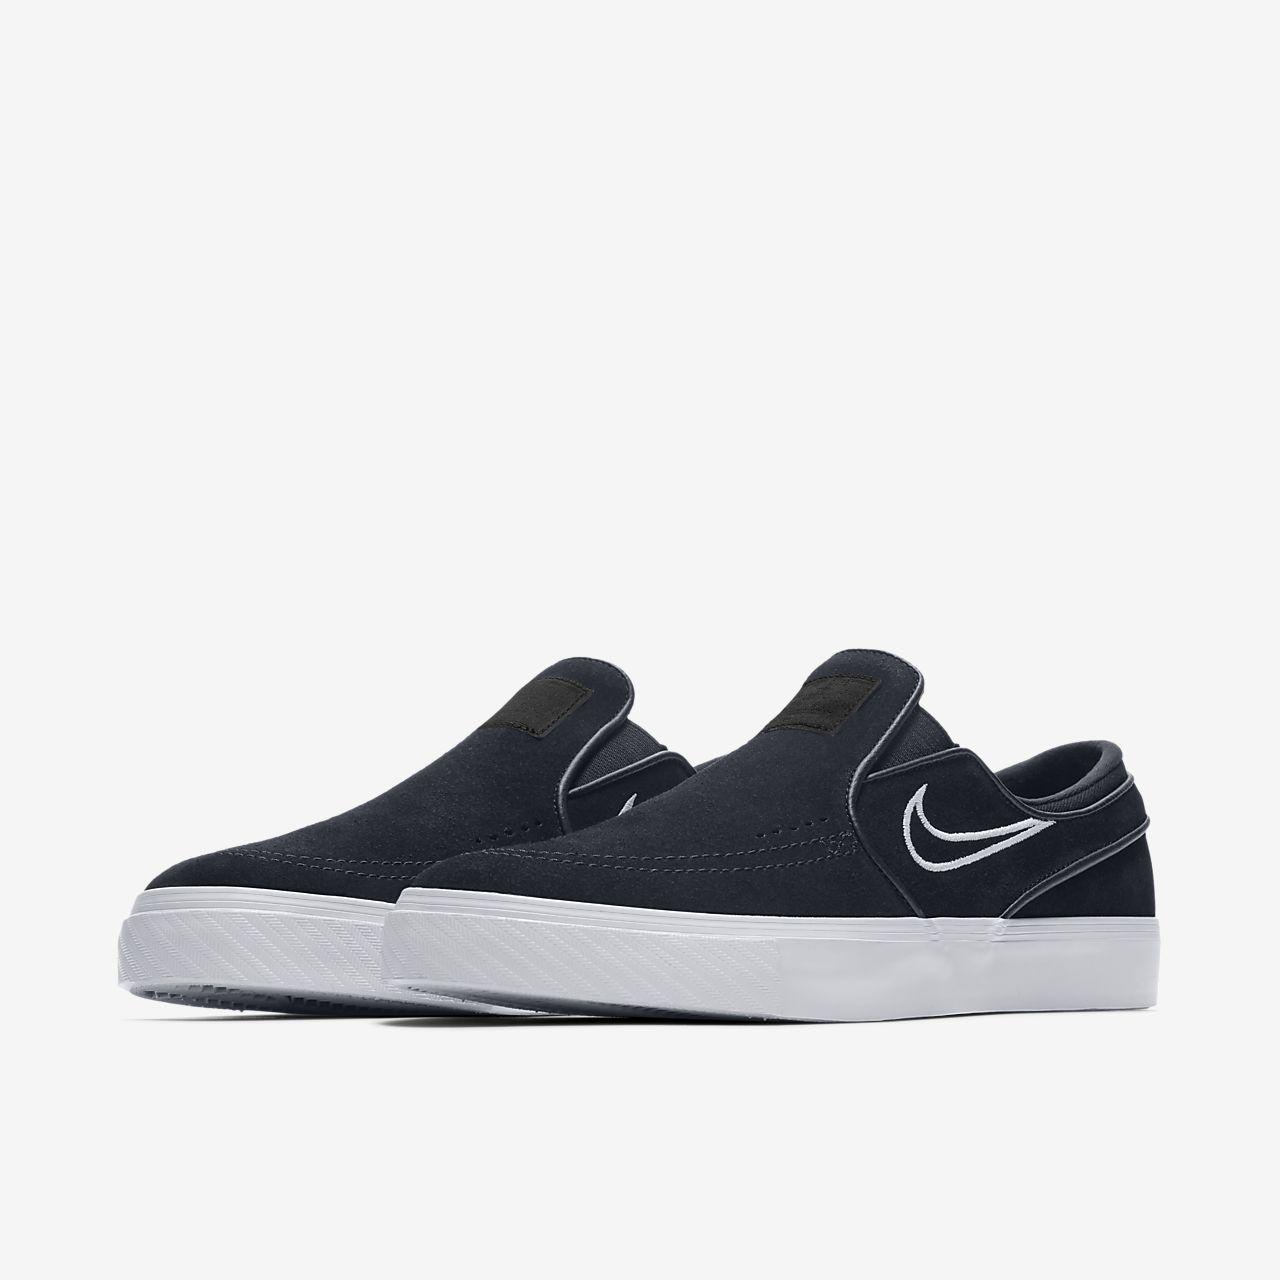 ... Nike SB Zoom Stefan Janoski Slip-On Men's Skateboarding Shoe